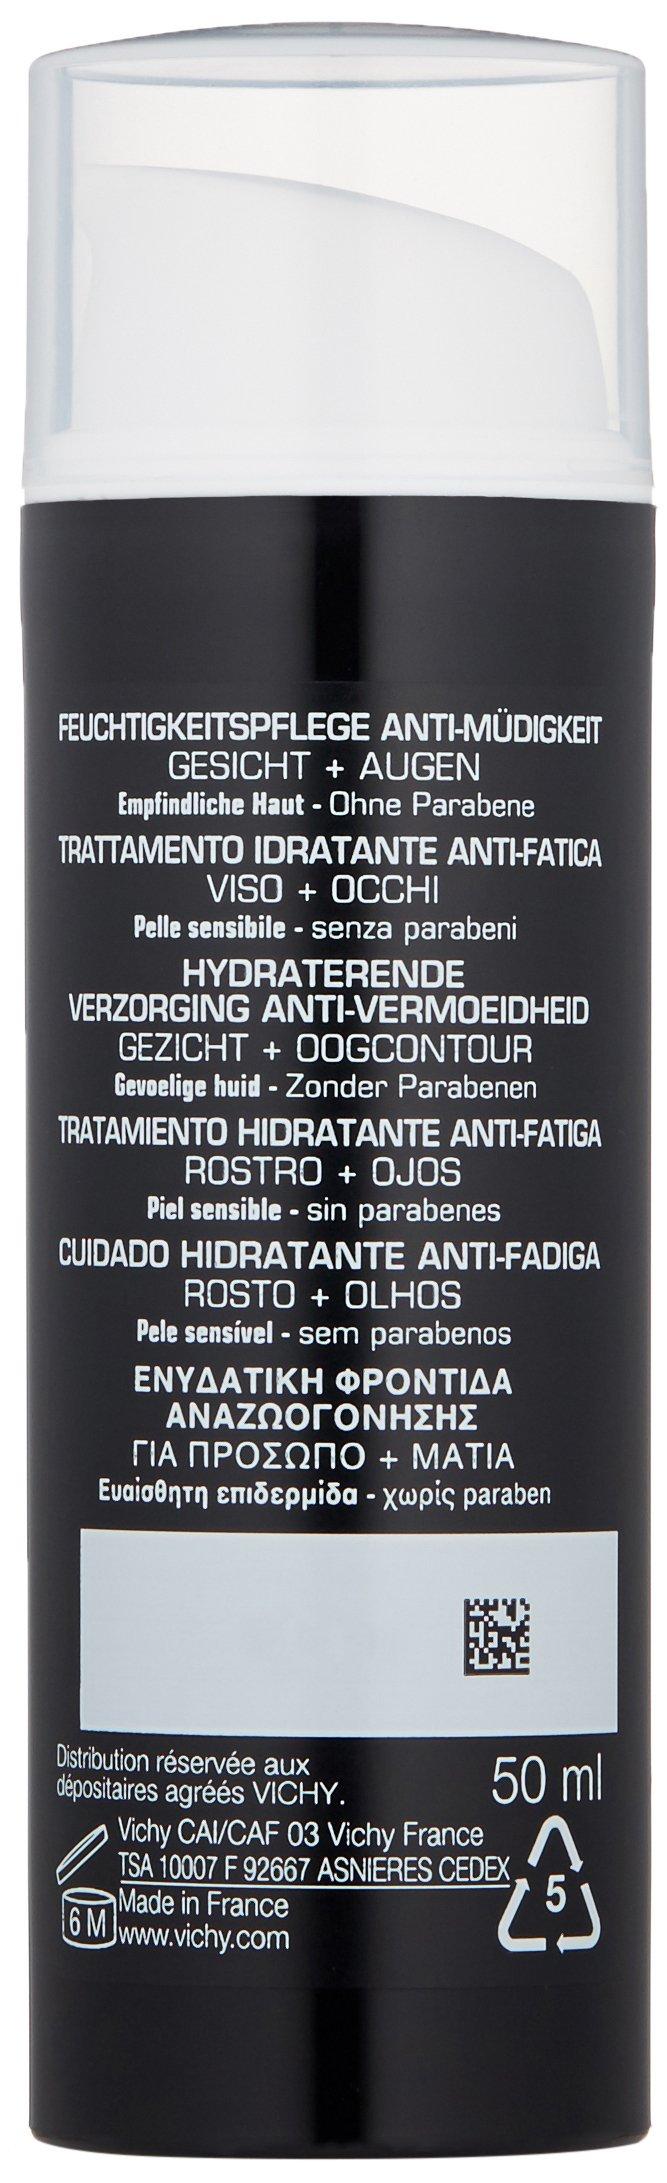 VICHY HOMME Hydra Mag C Hidratante Antifatiga 50 ml